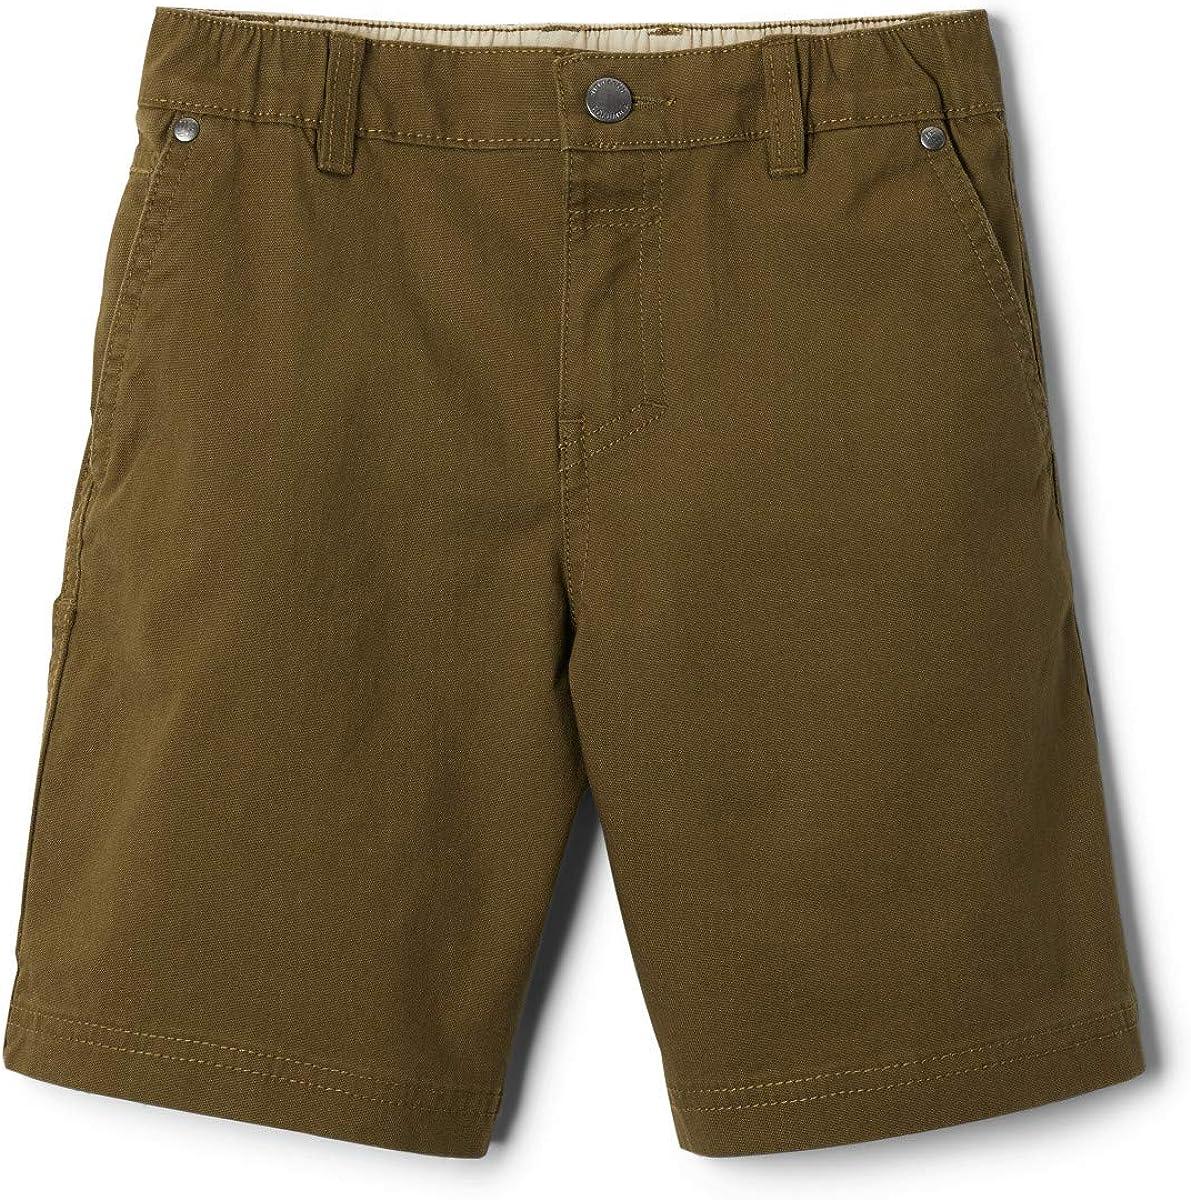 Columbia Boys' Flex ROC Shorts, Comfort Stretch, Cotton Blend